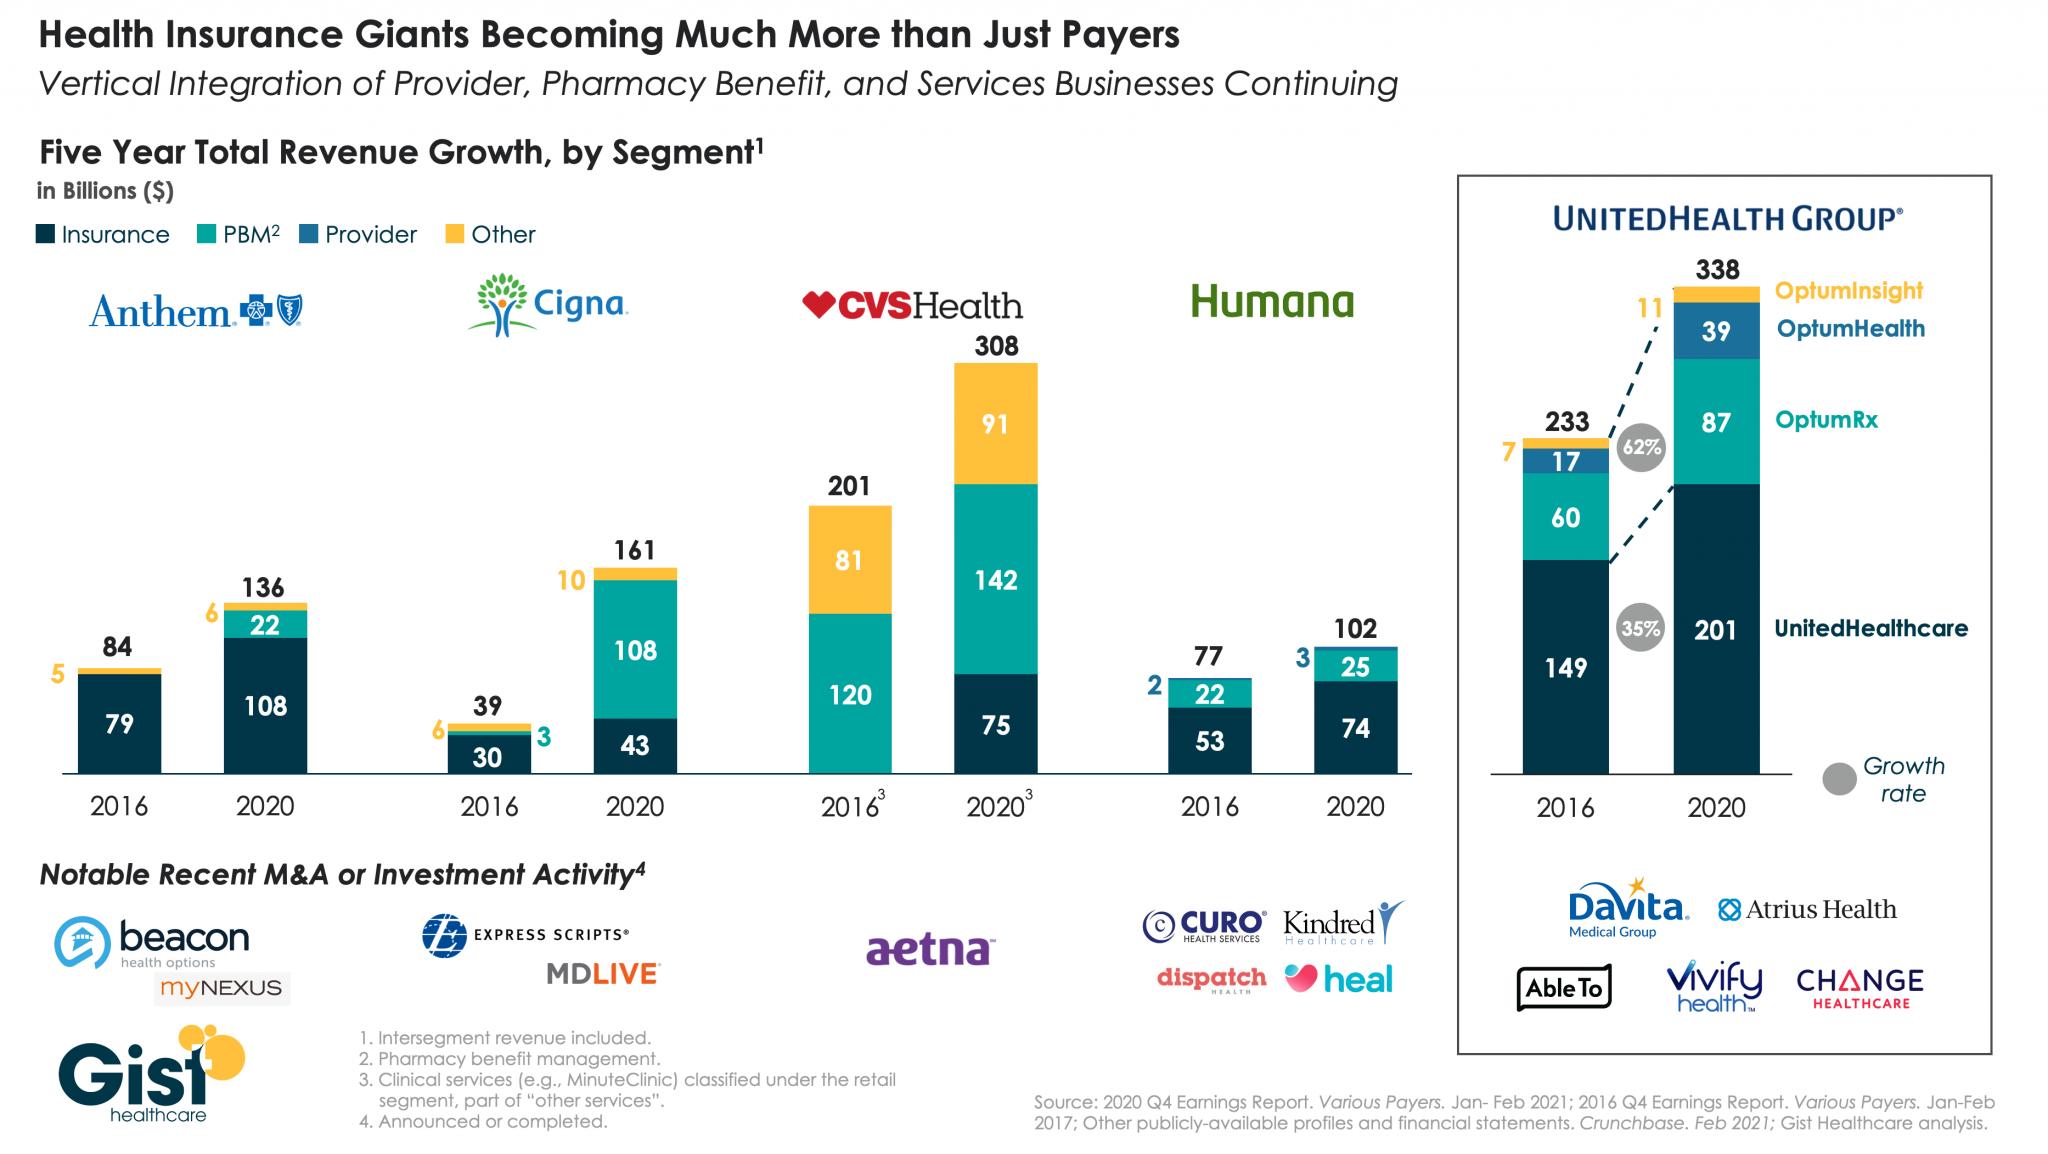 Payer vertical integration